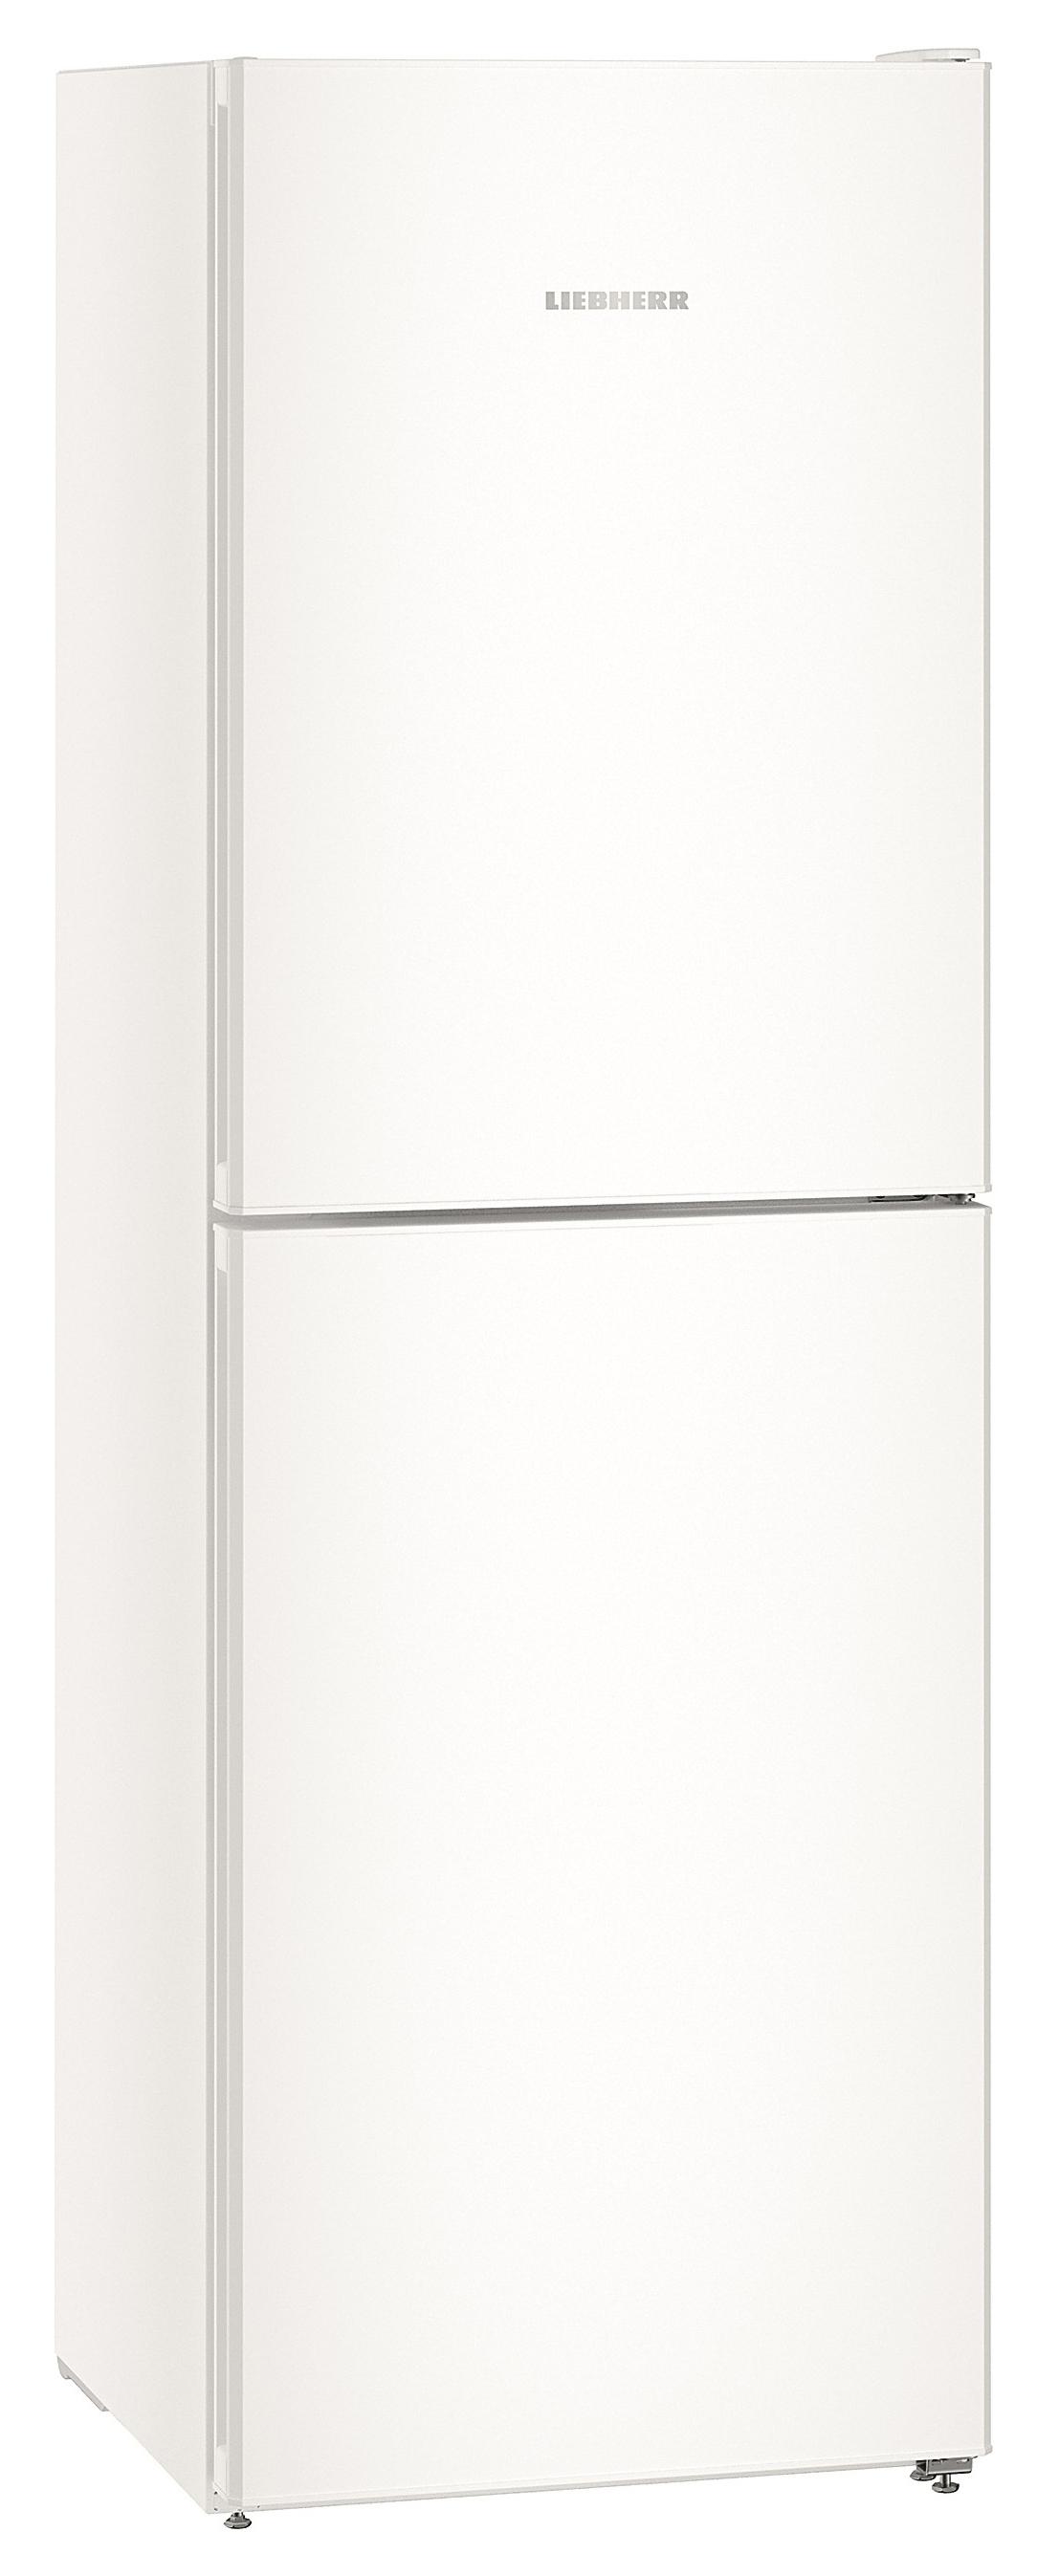 Двухкамерный холодильник LIEBHERR CN 4213-21